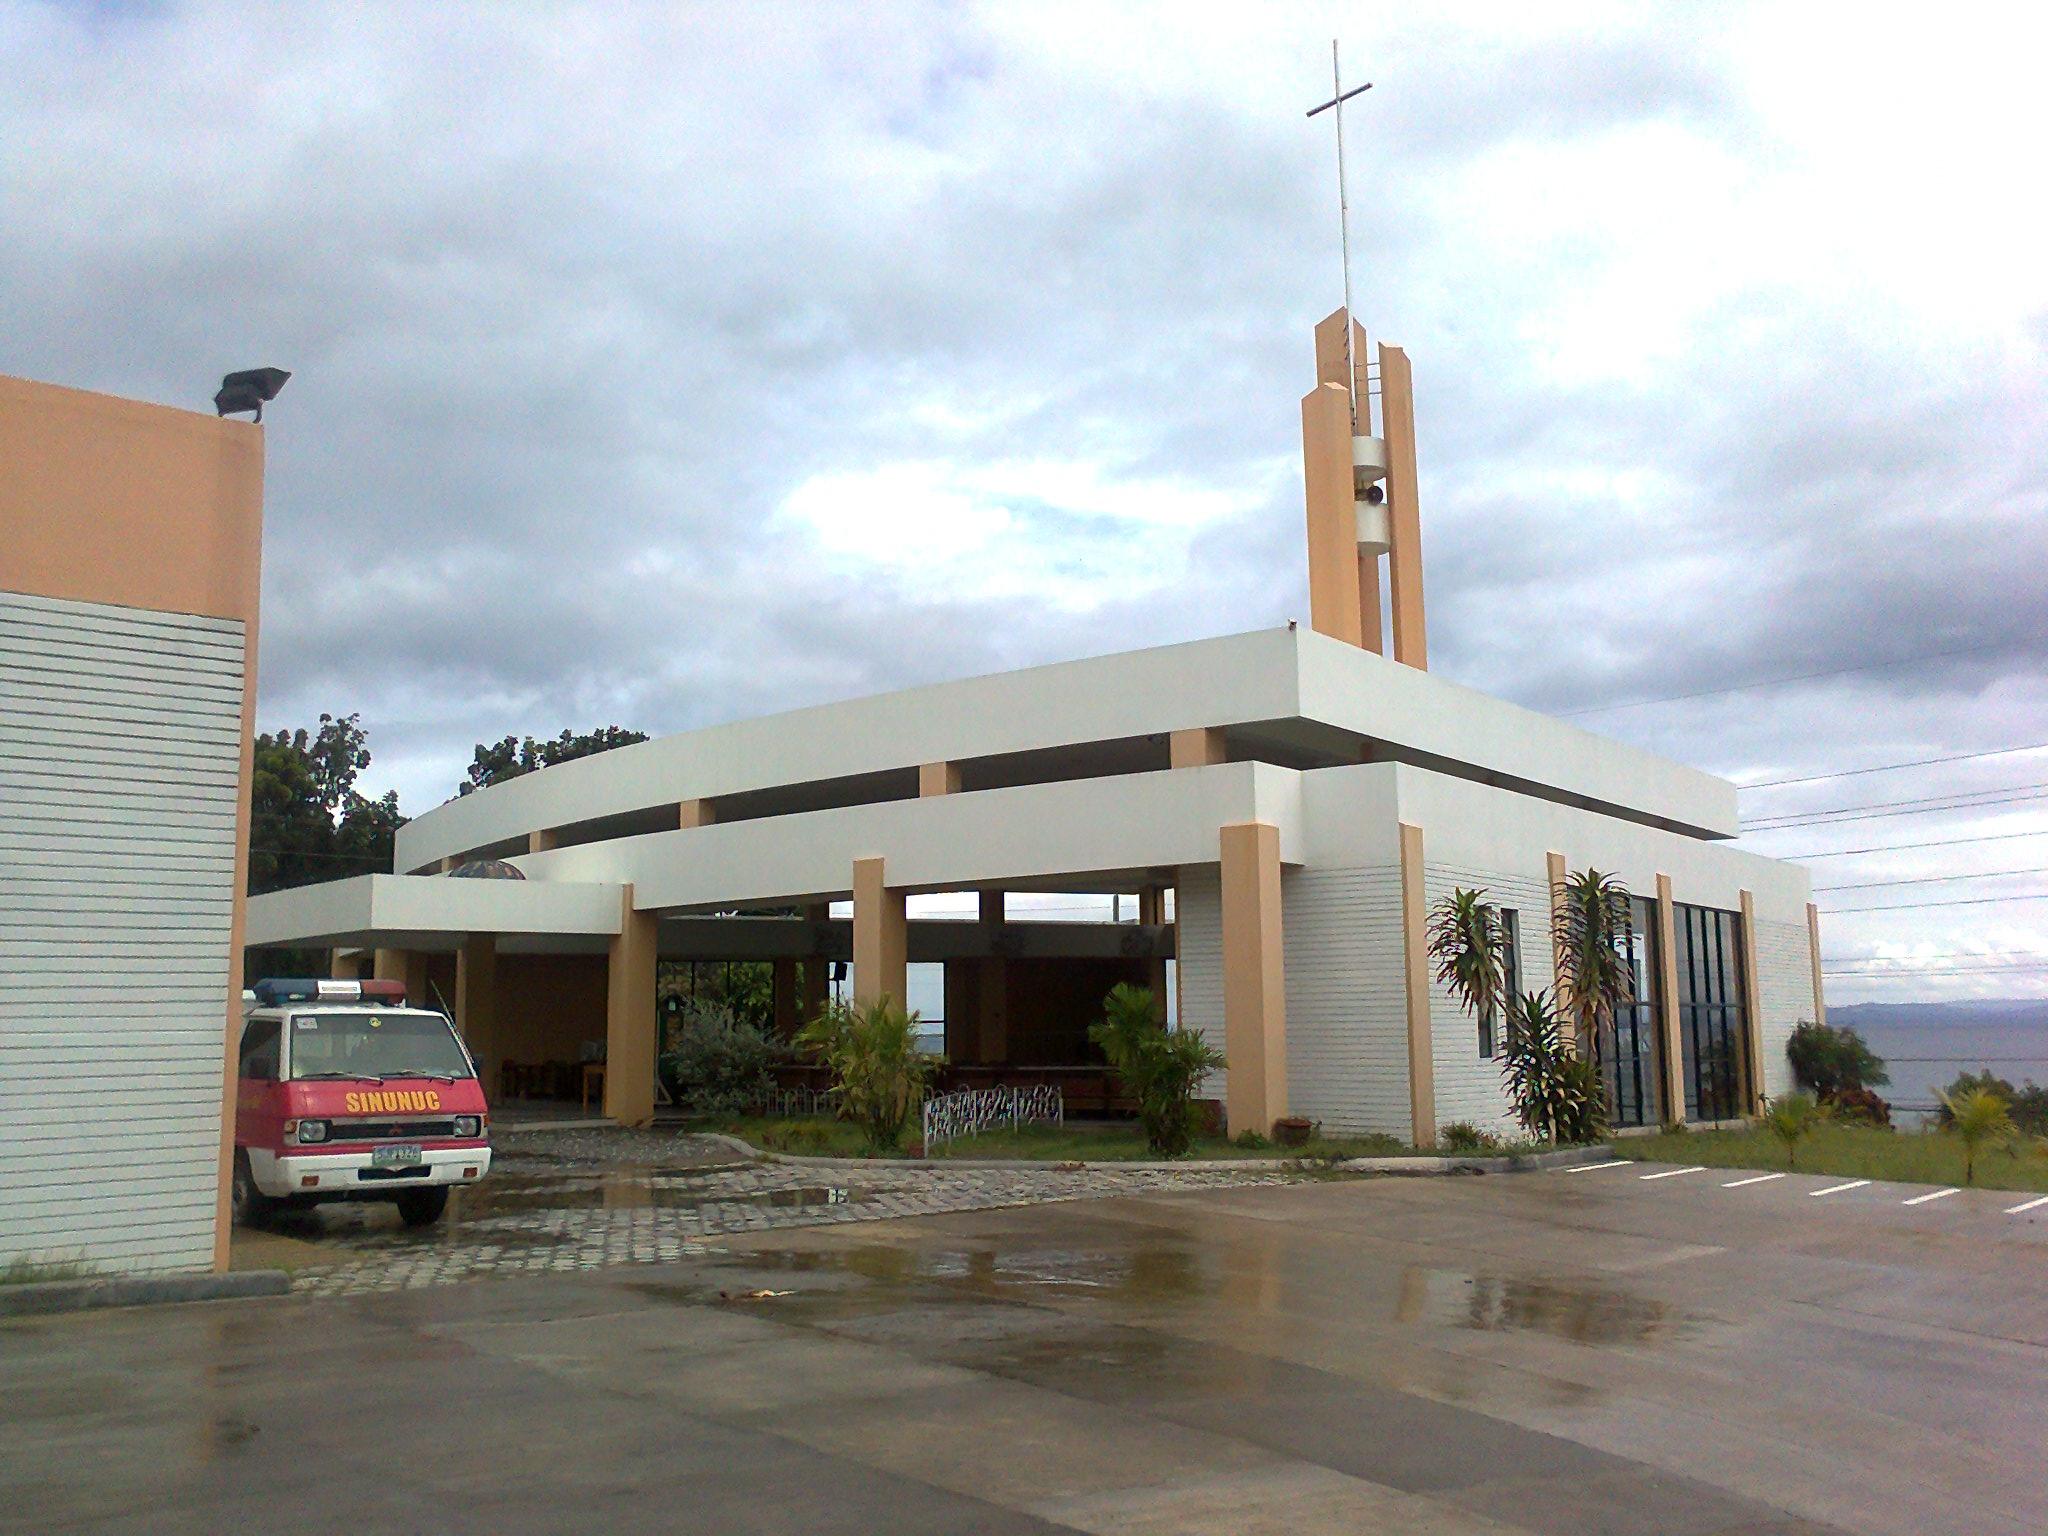 FileTransfiguration Parish Church Sinunuc Zamboanga City 9jpg